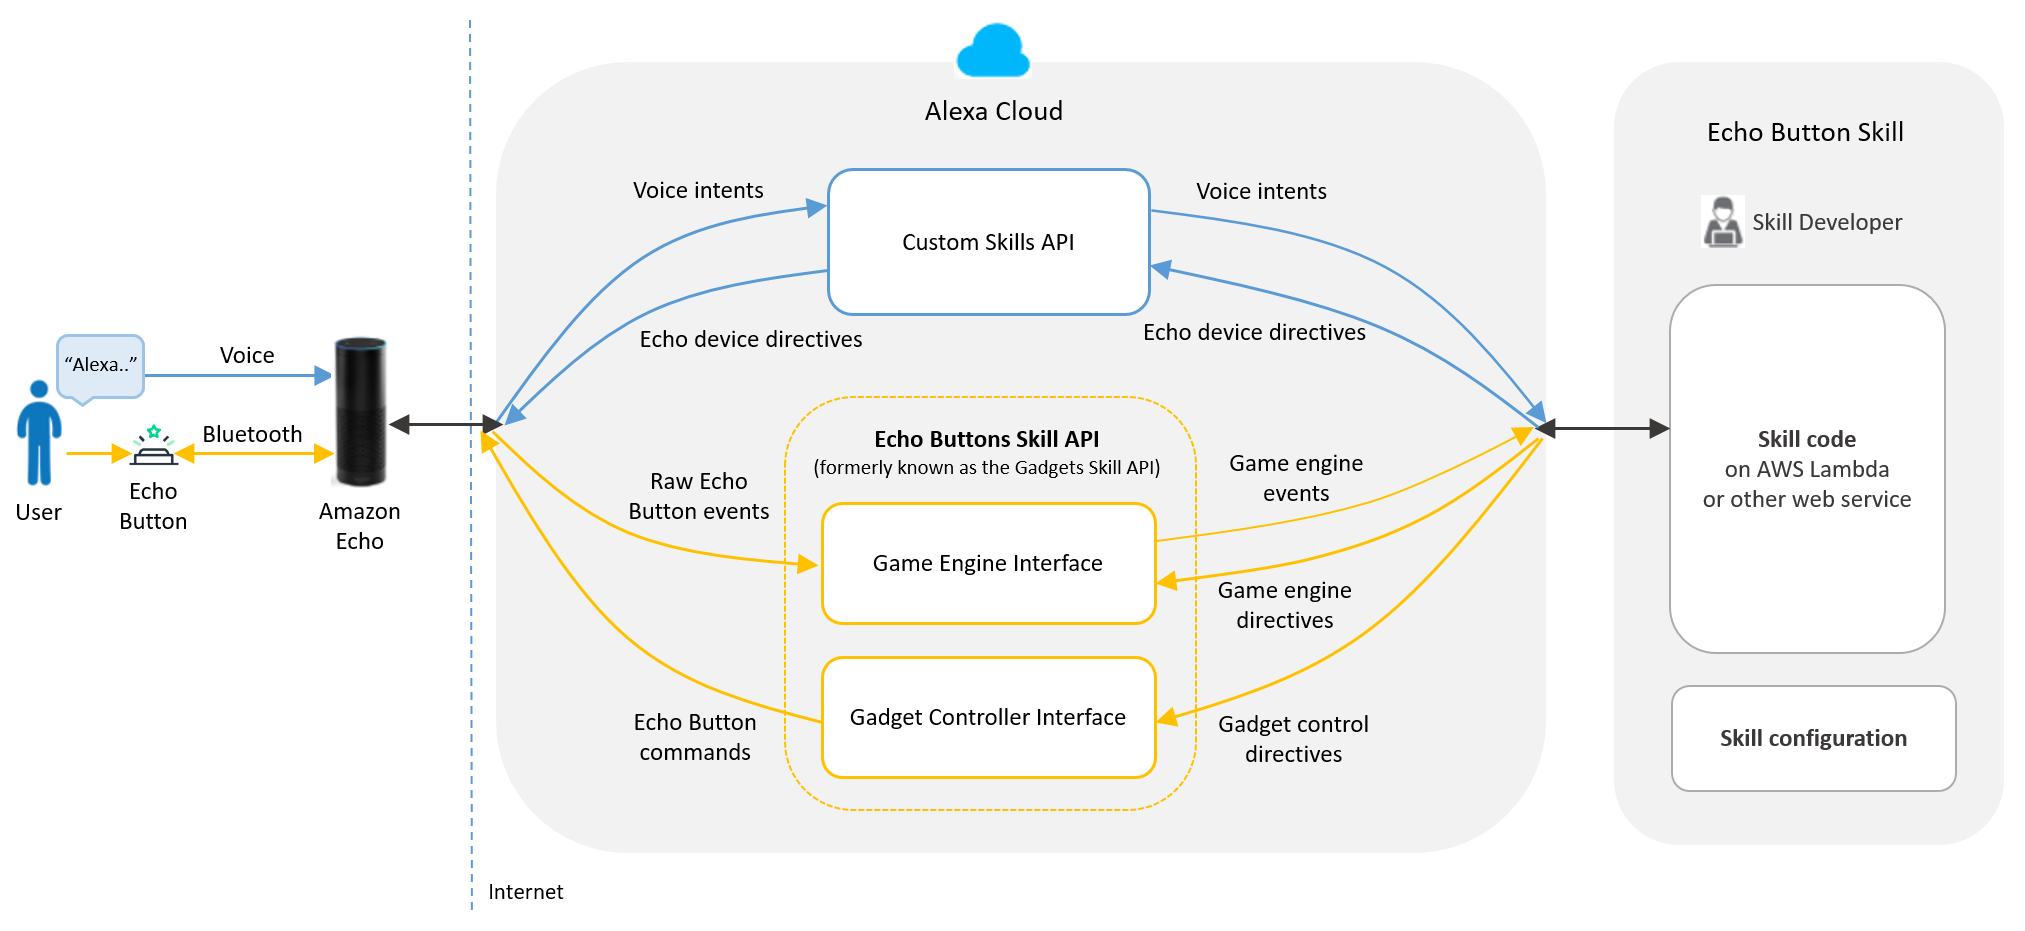 Echo Buttons Skill API